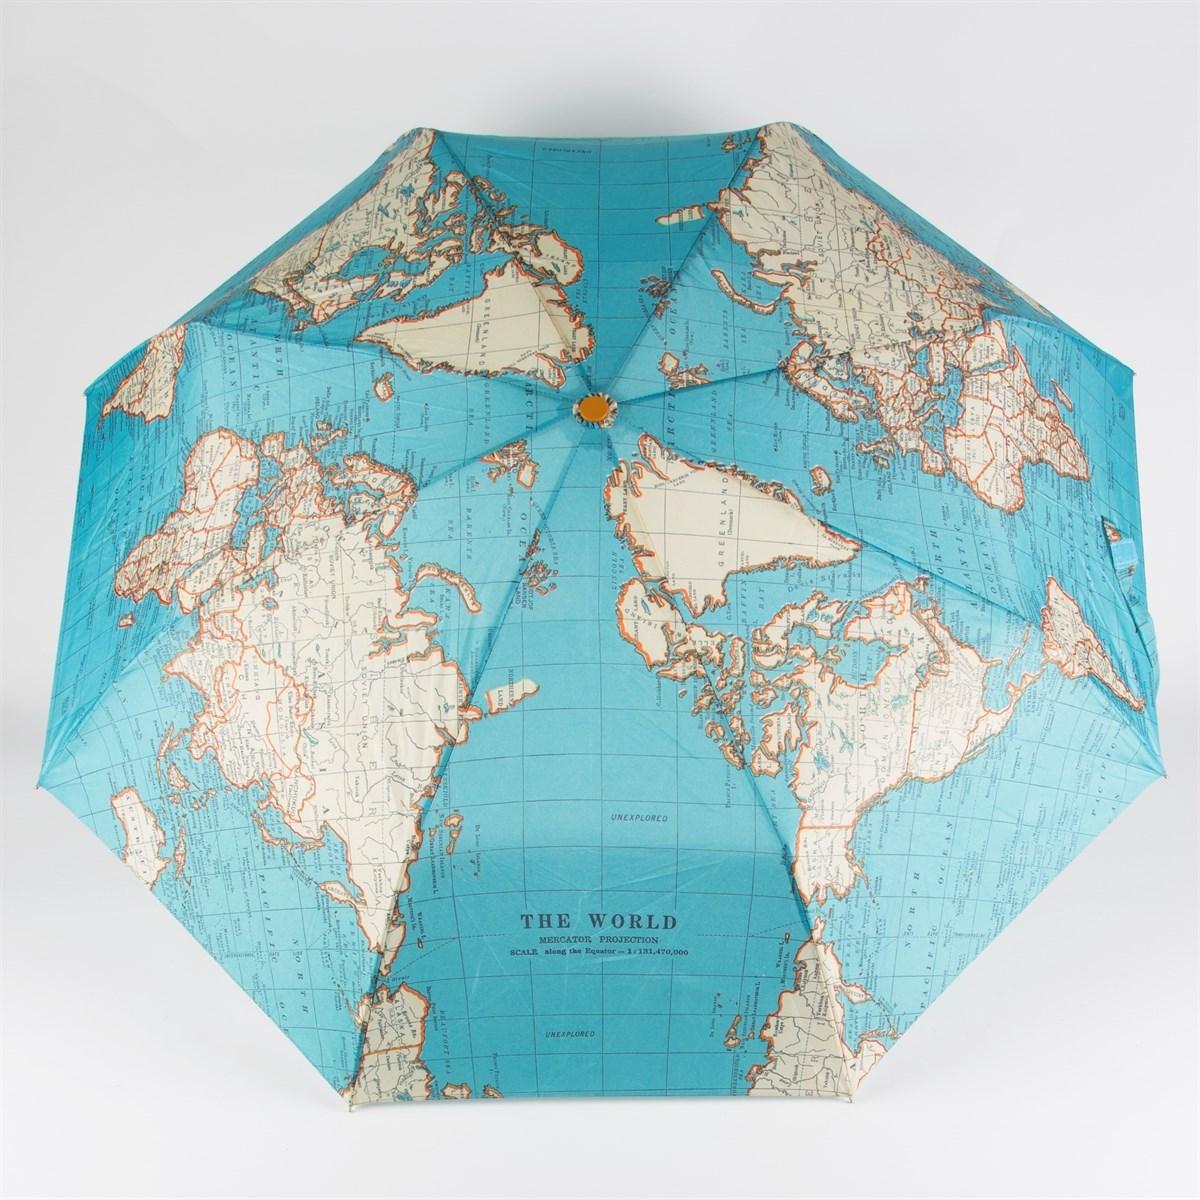 Vintage map folding umbrella vintage map folding umbrella alternative image 3 gumiabroncs Images